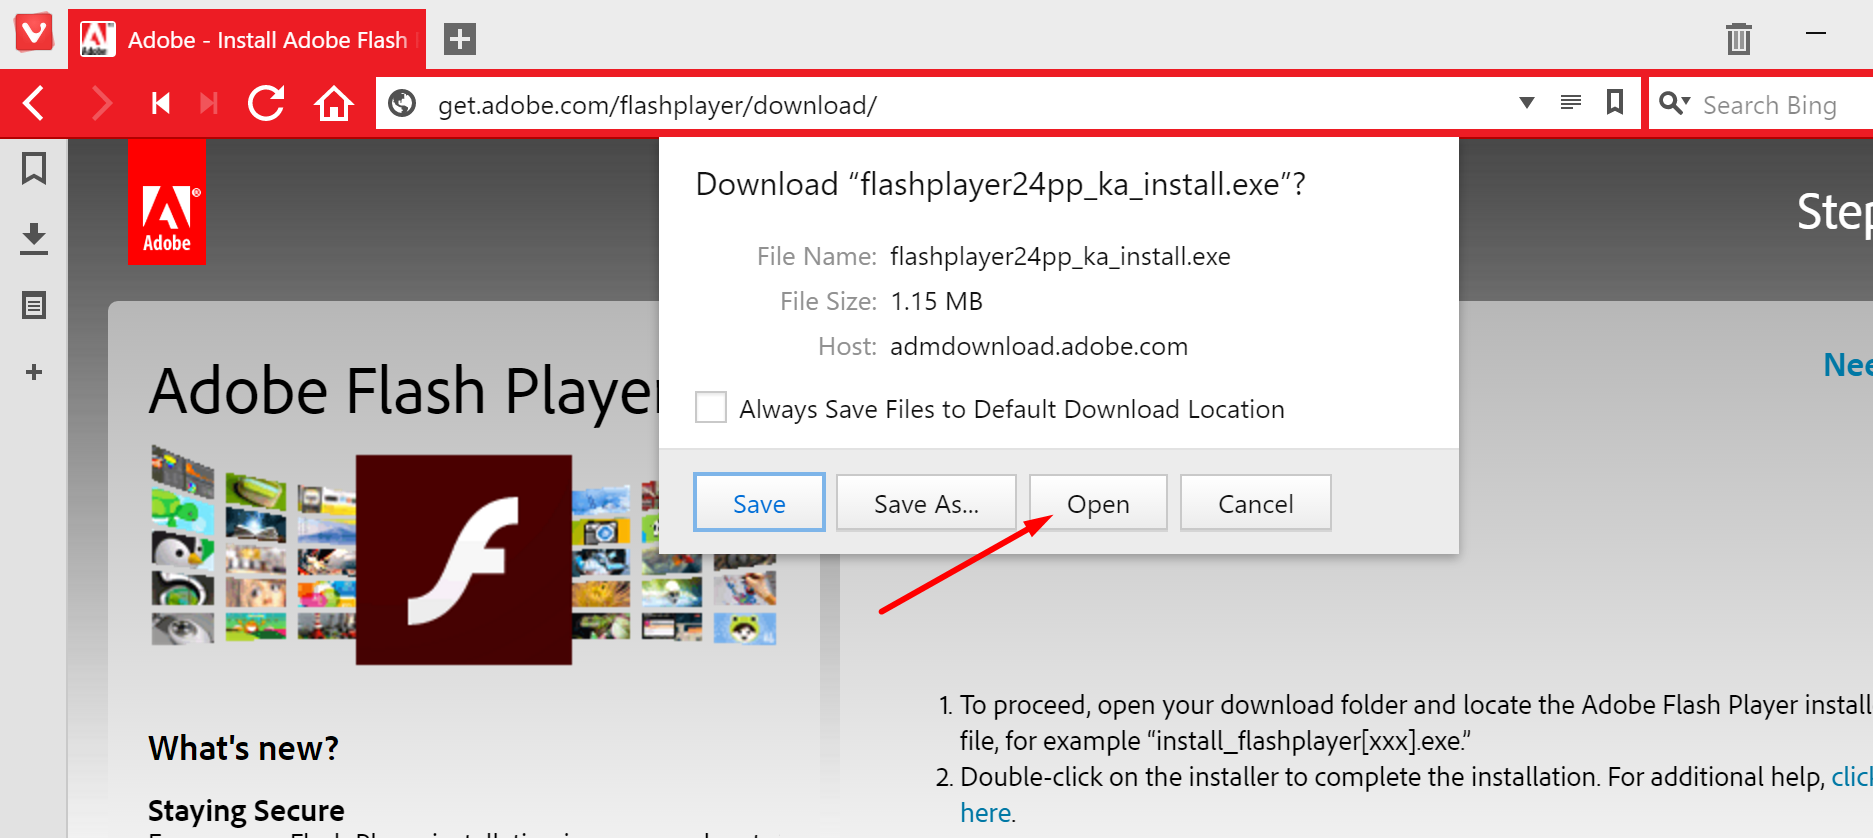 flashplayer18pp da install.exe